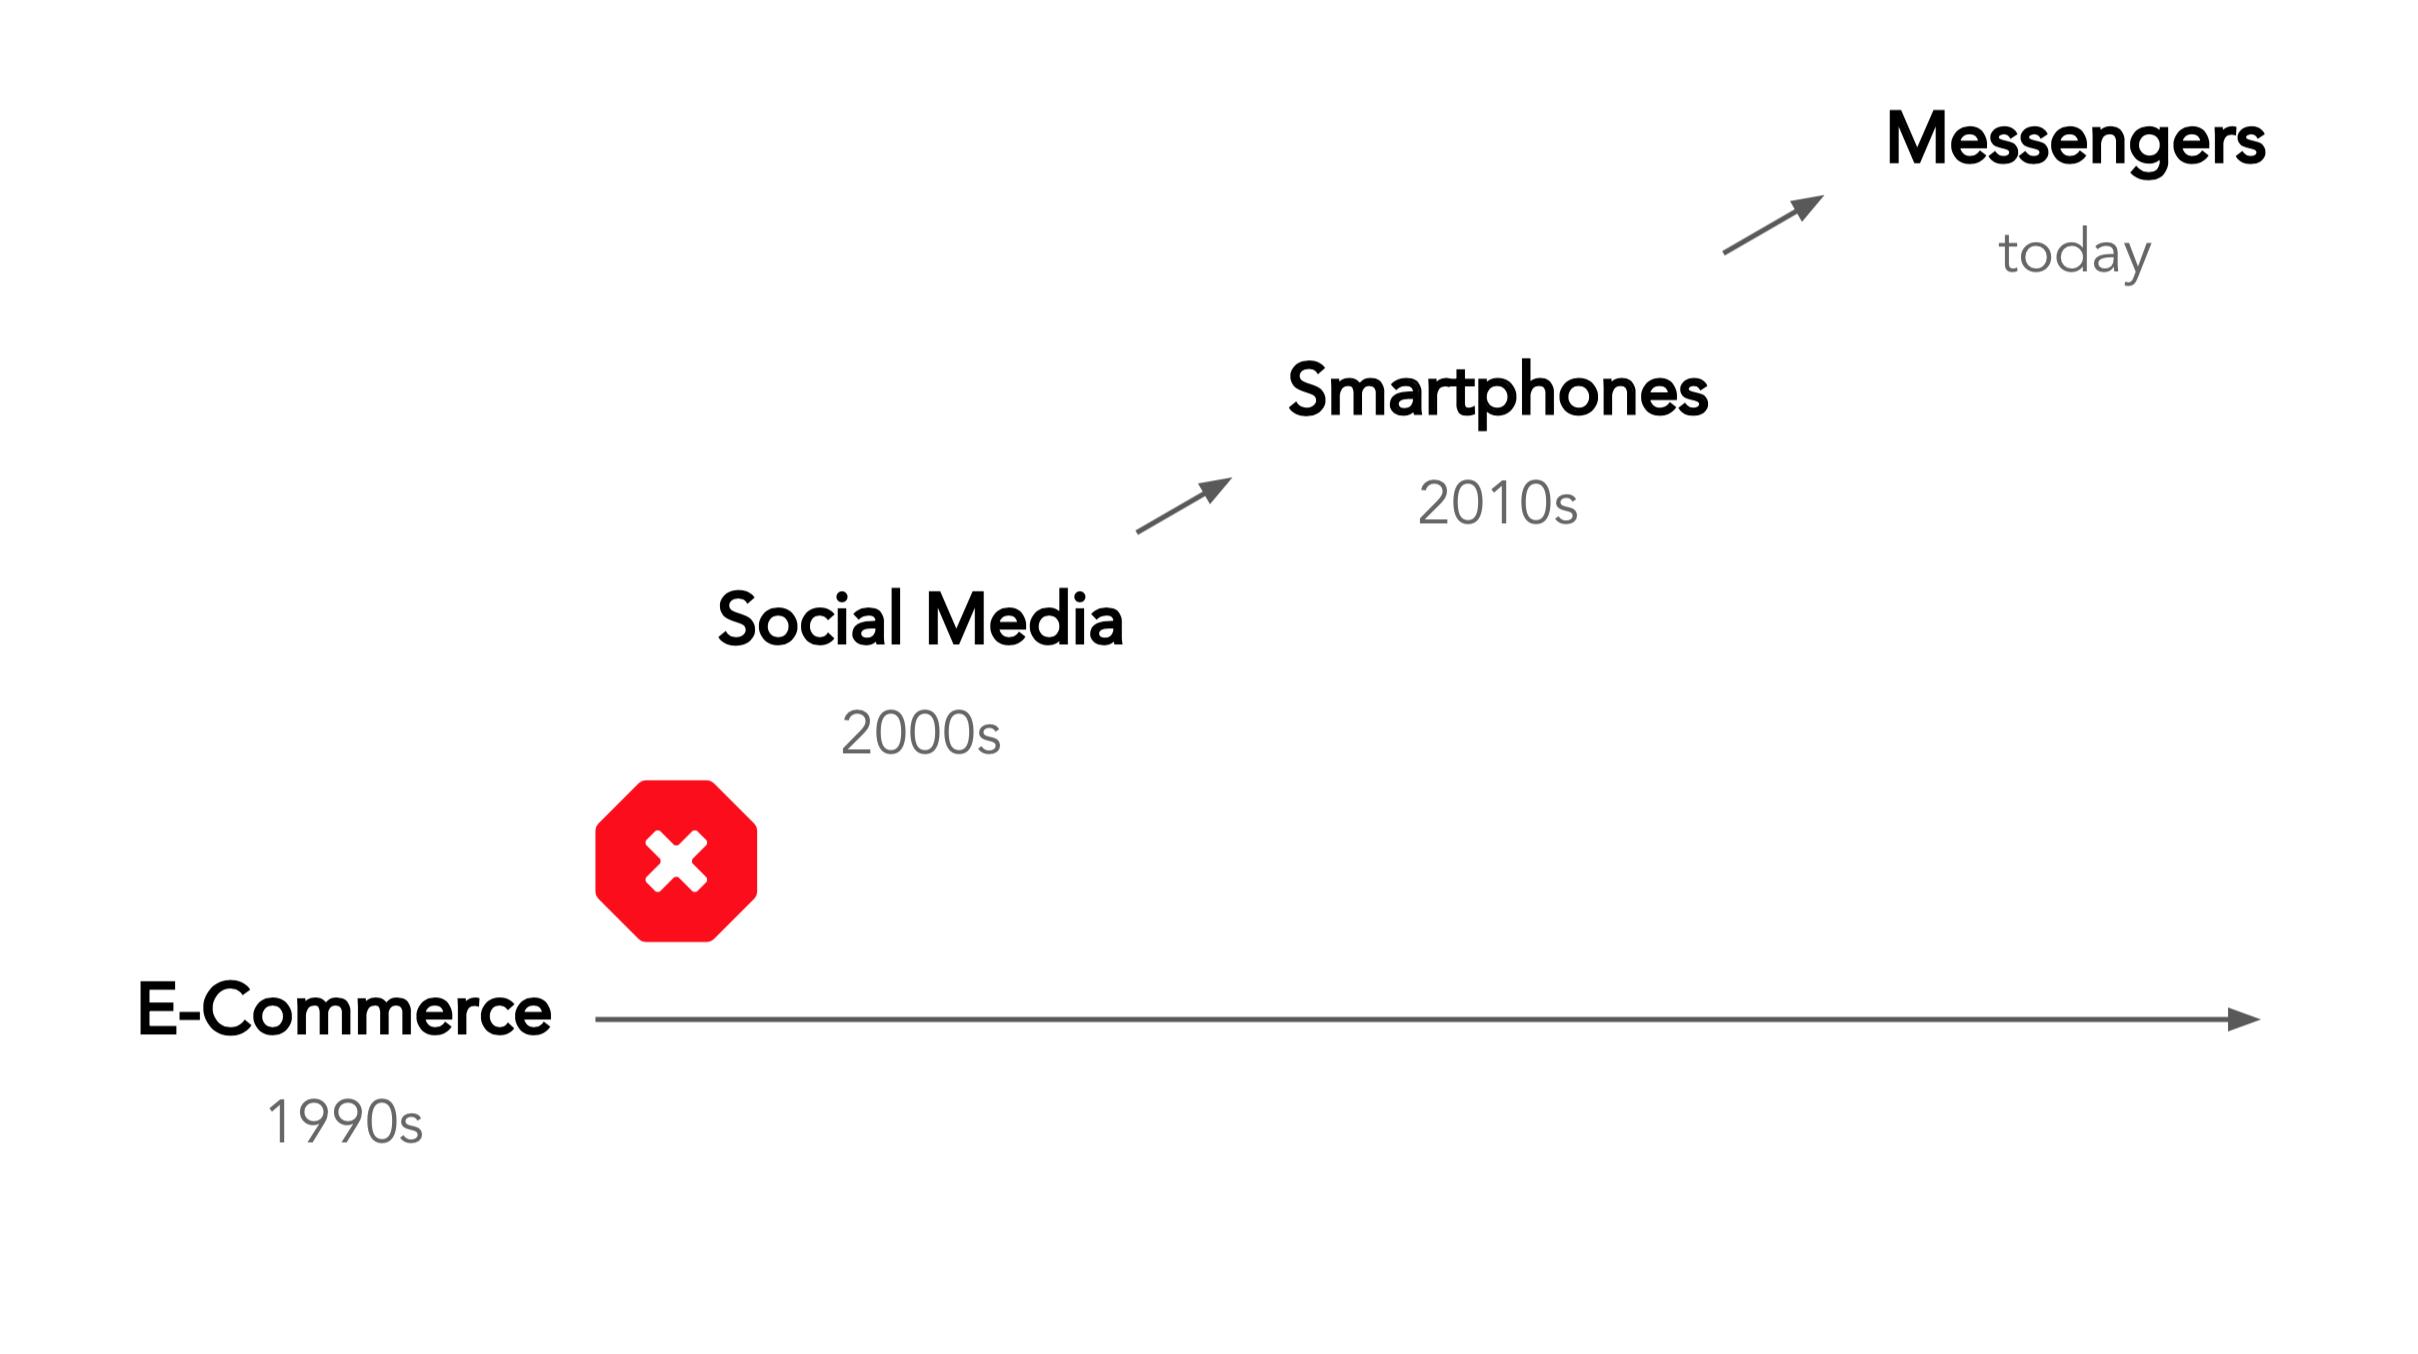 Groupify-Visual-1-E-Commerce-vs-Social-c-Groupify-GmbH